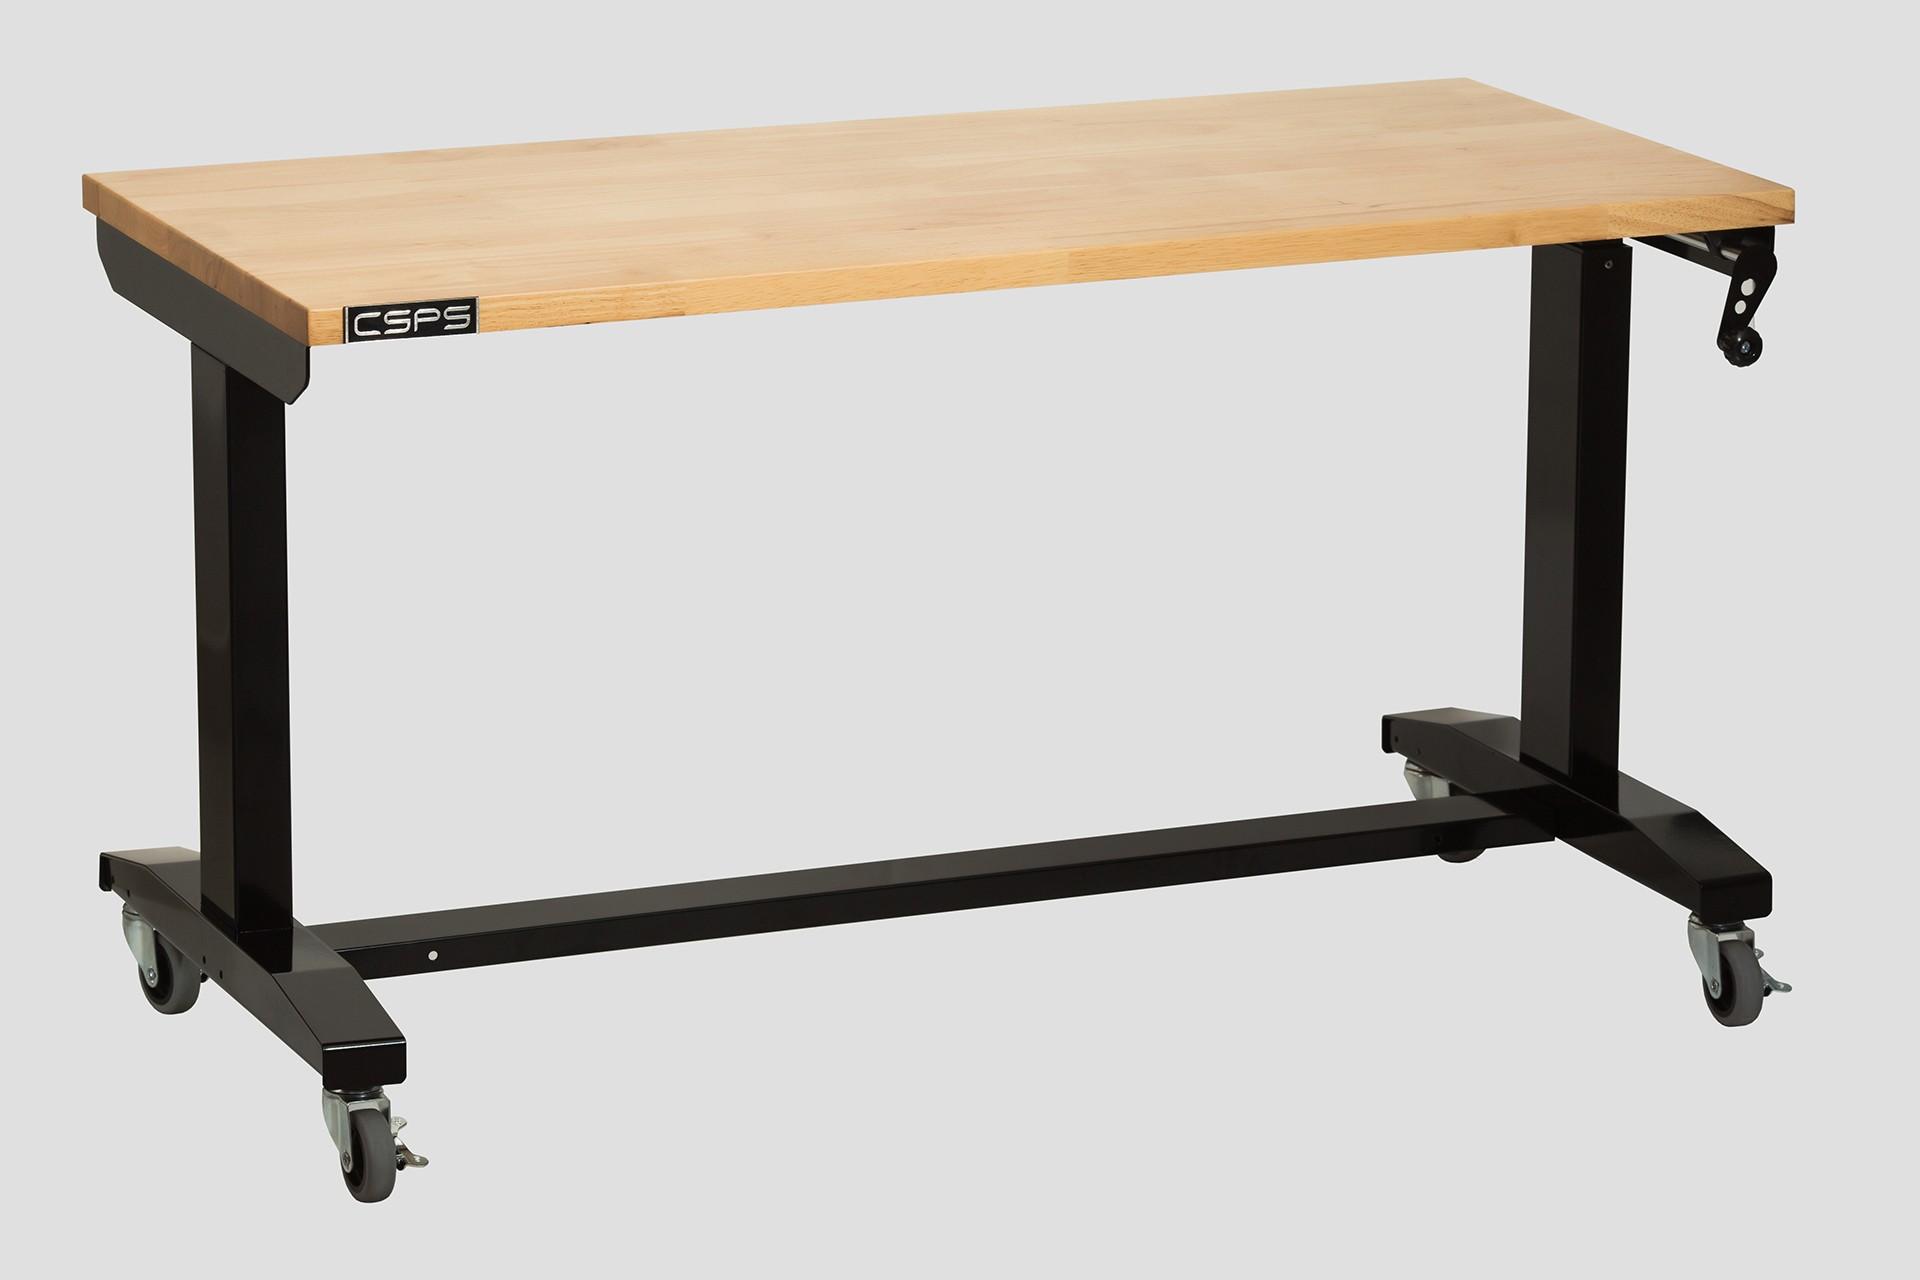 Adjustable table / CSPS CO., LTD.